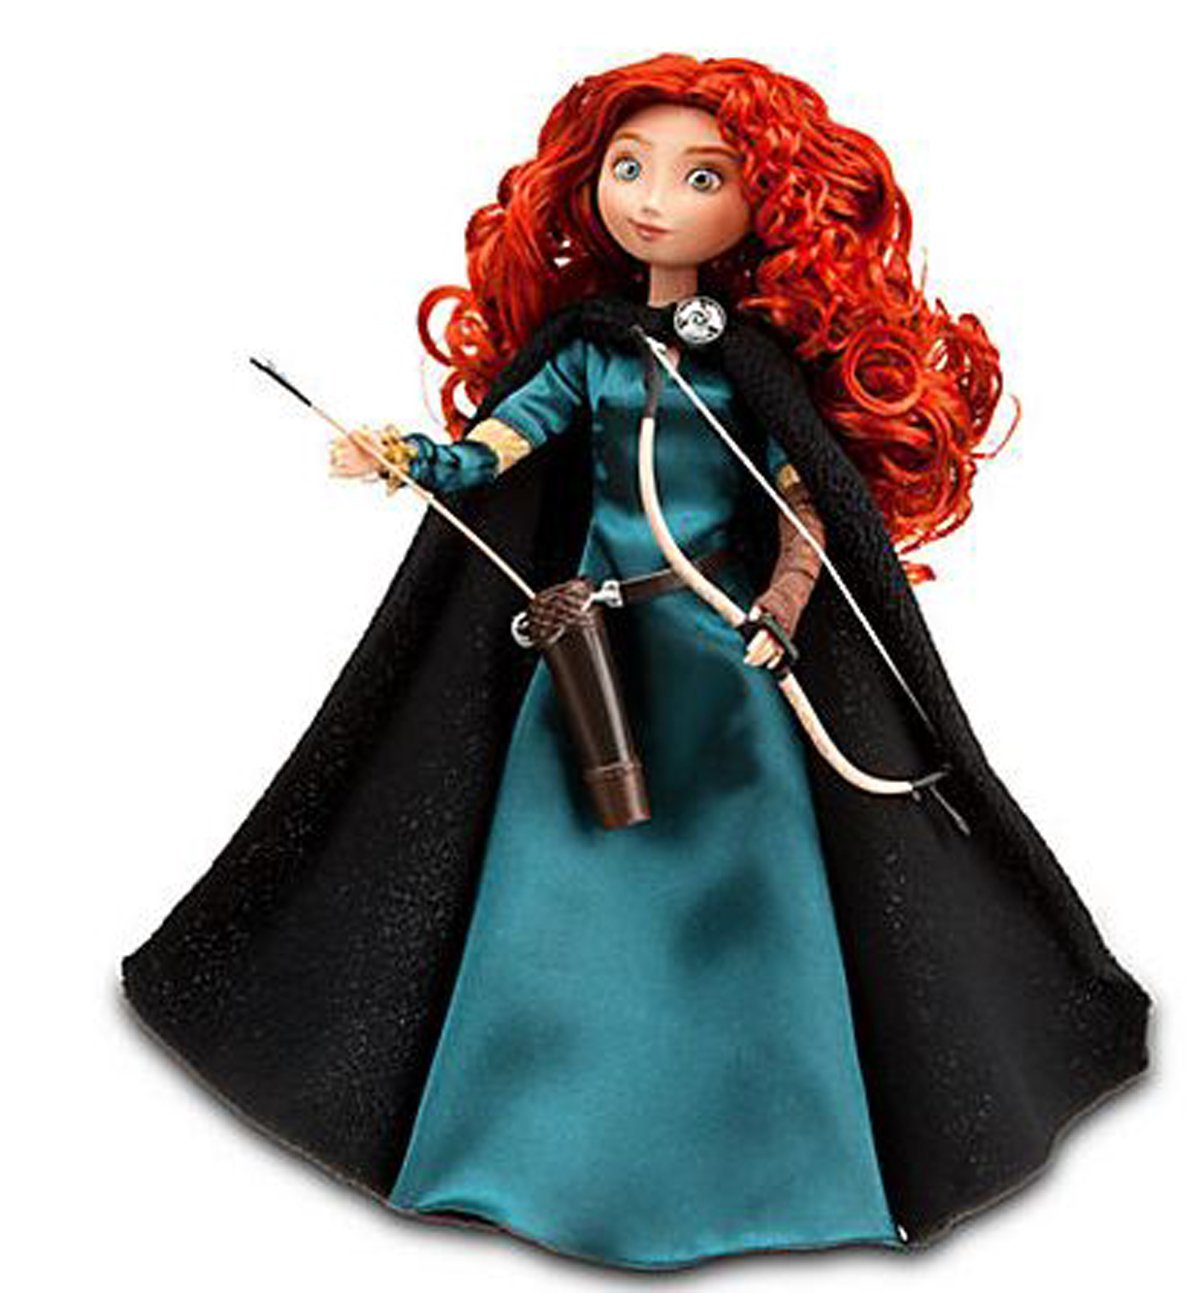 Disney's Merida Doll Makeover: Good Merida Vs Bad Merida